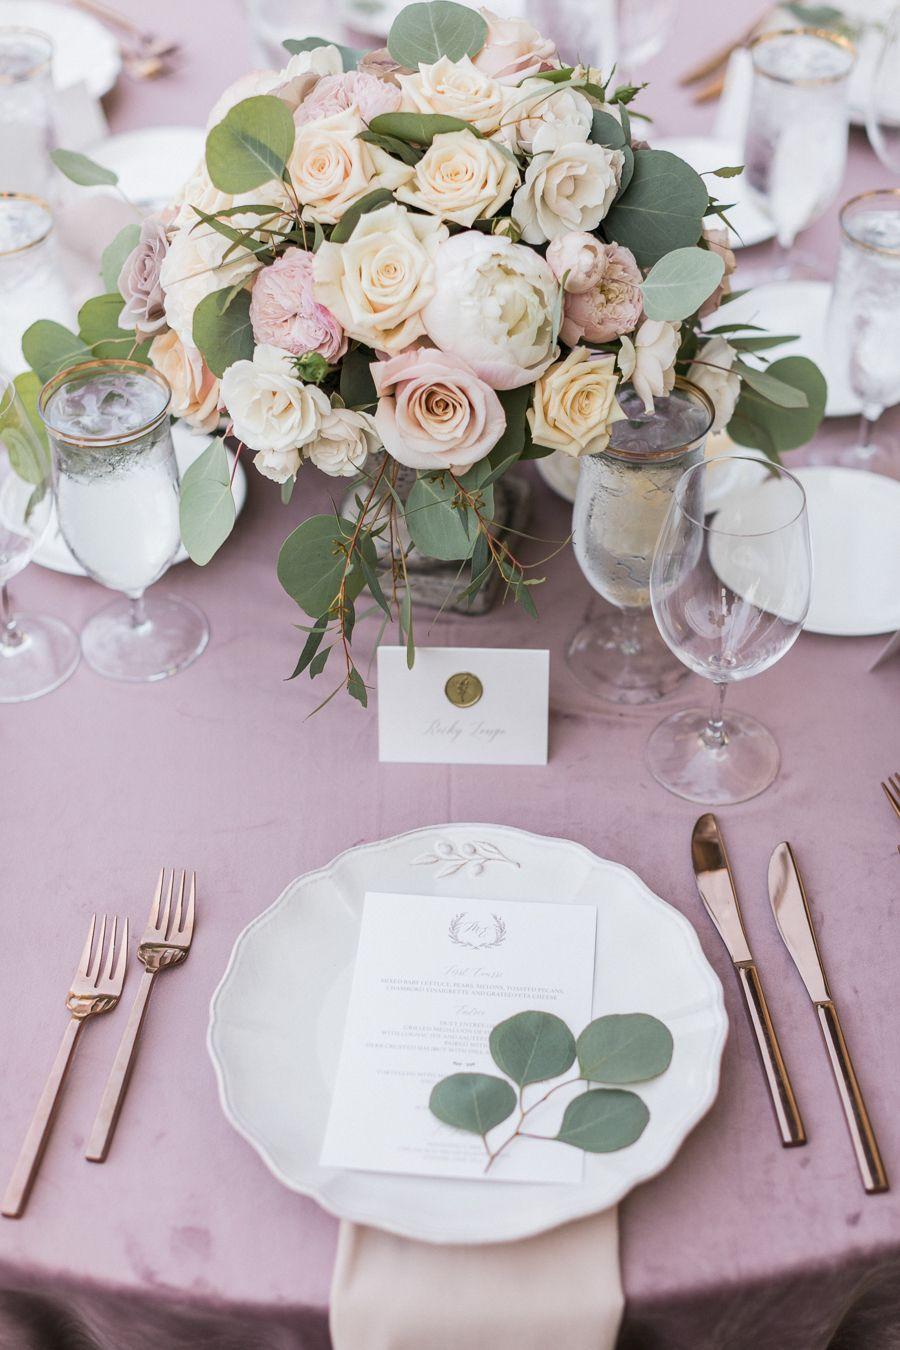 Wedding decorations traditional october 2018 Mauve  cream beauty  Photography Jasmine Lee romanticweddings